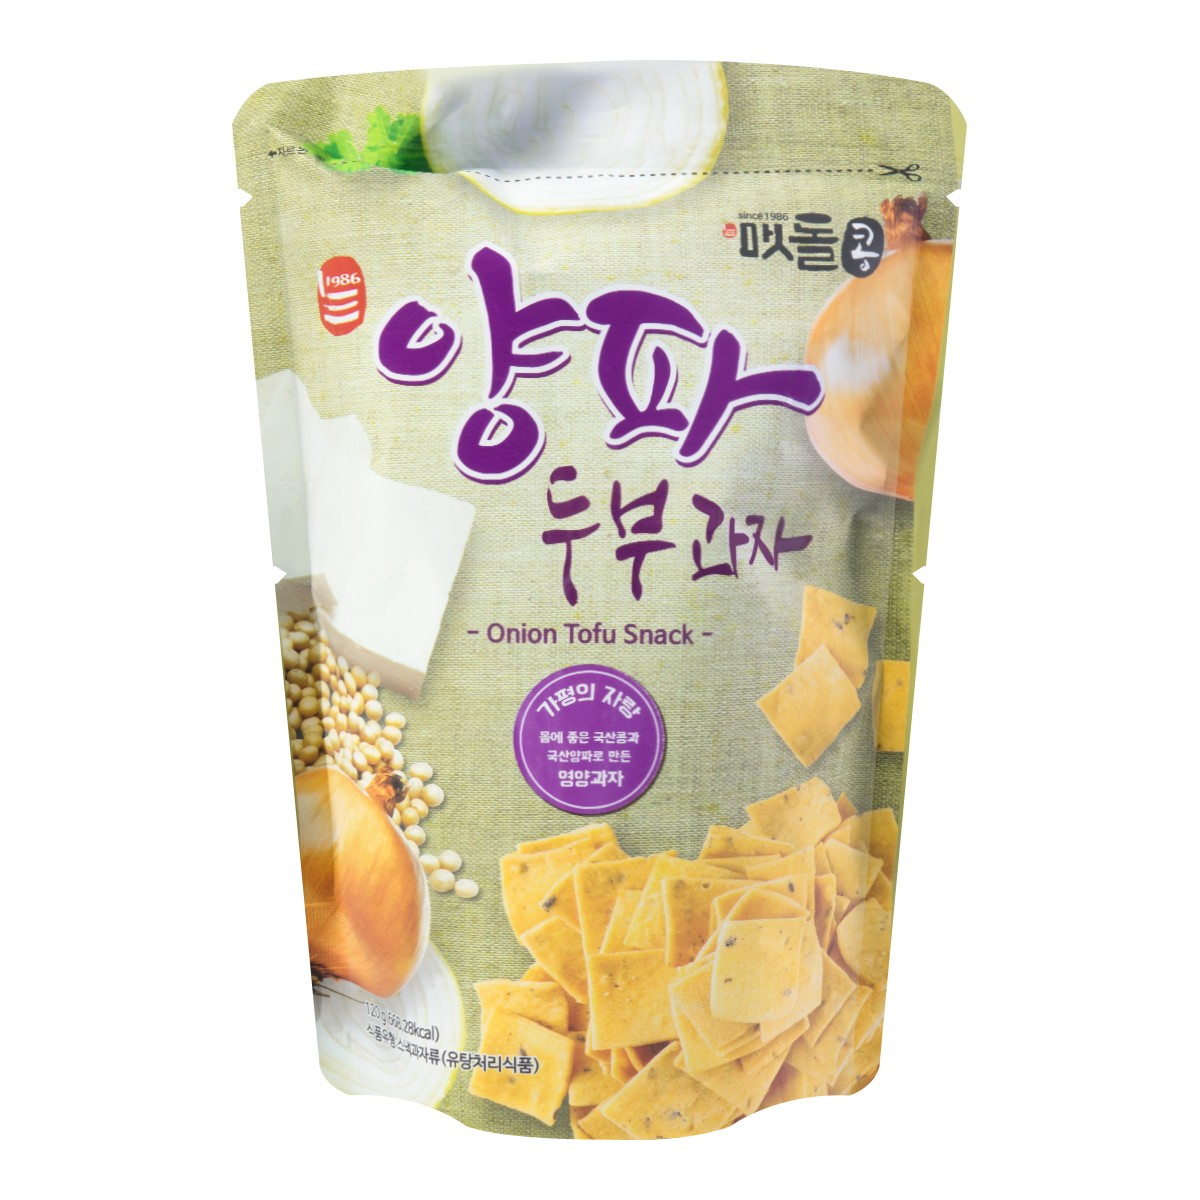 Yamibuy.com:Customer reviews:Onion & Tofu Snack 120g